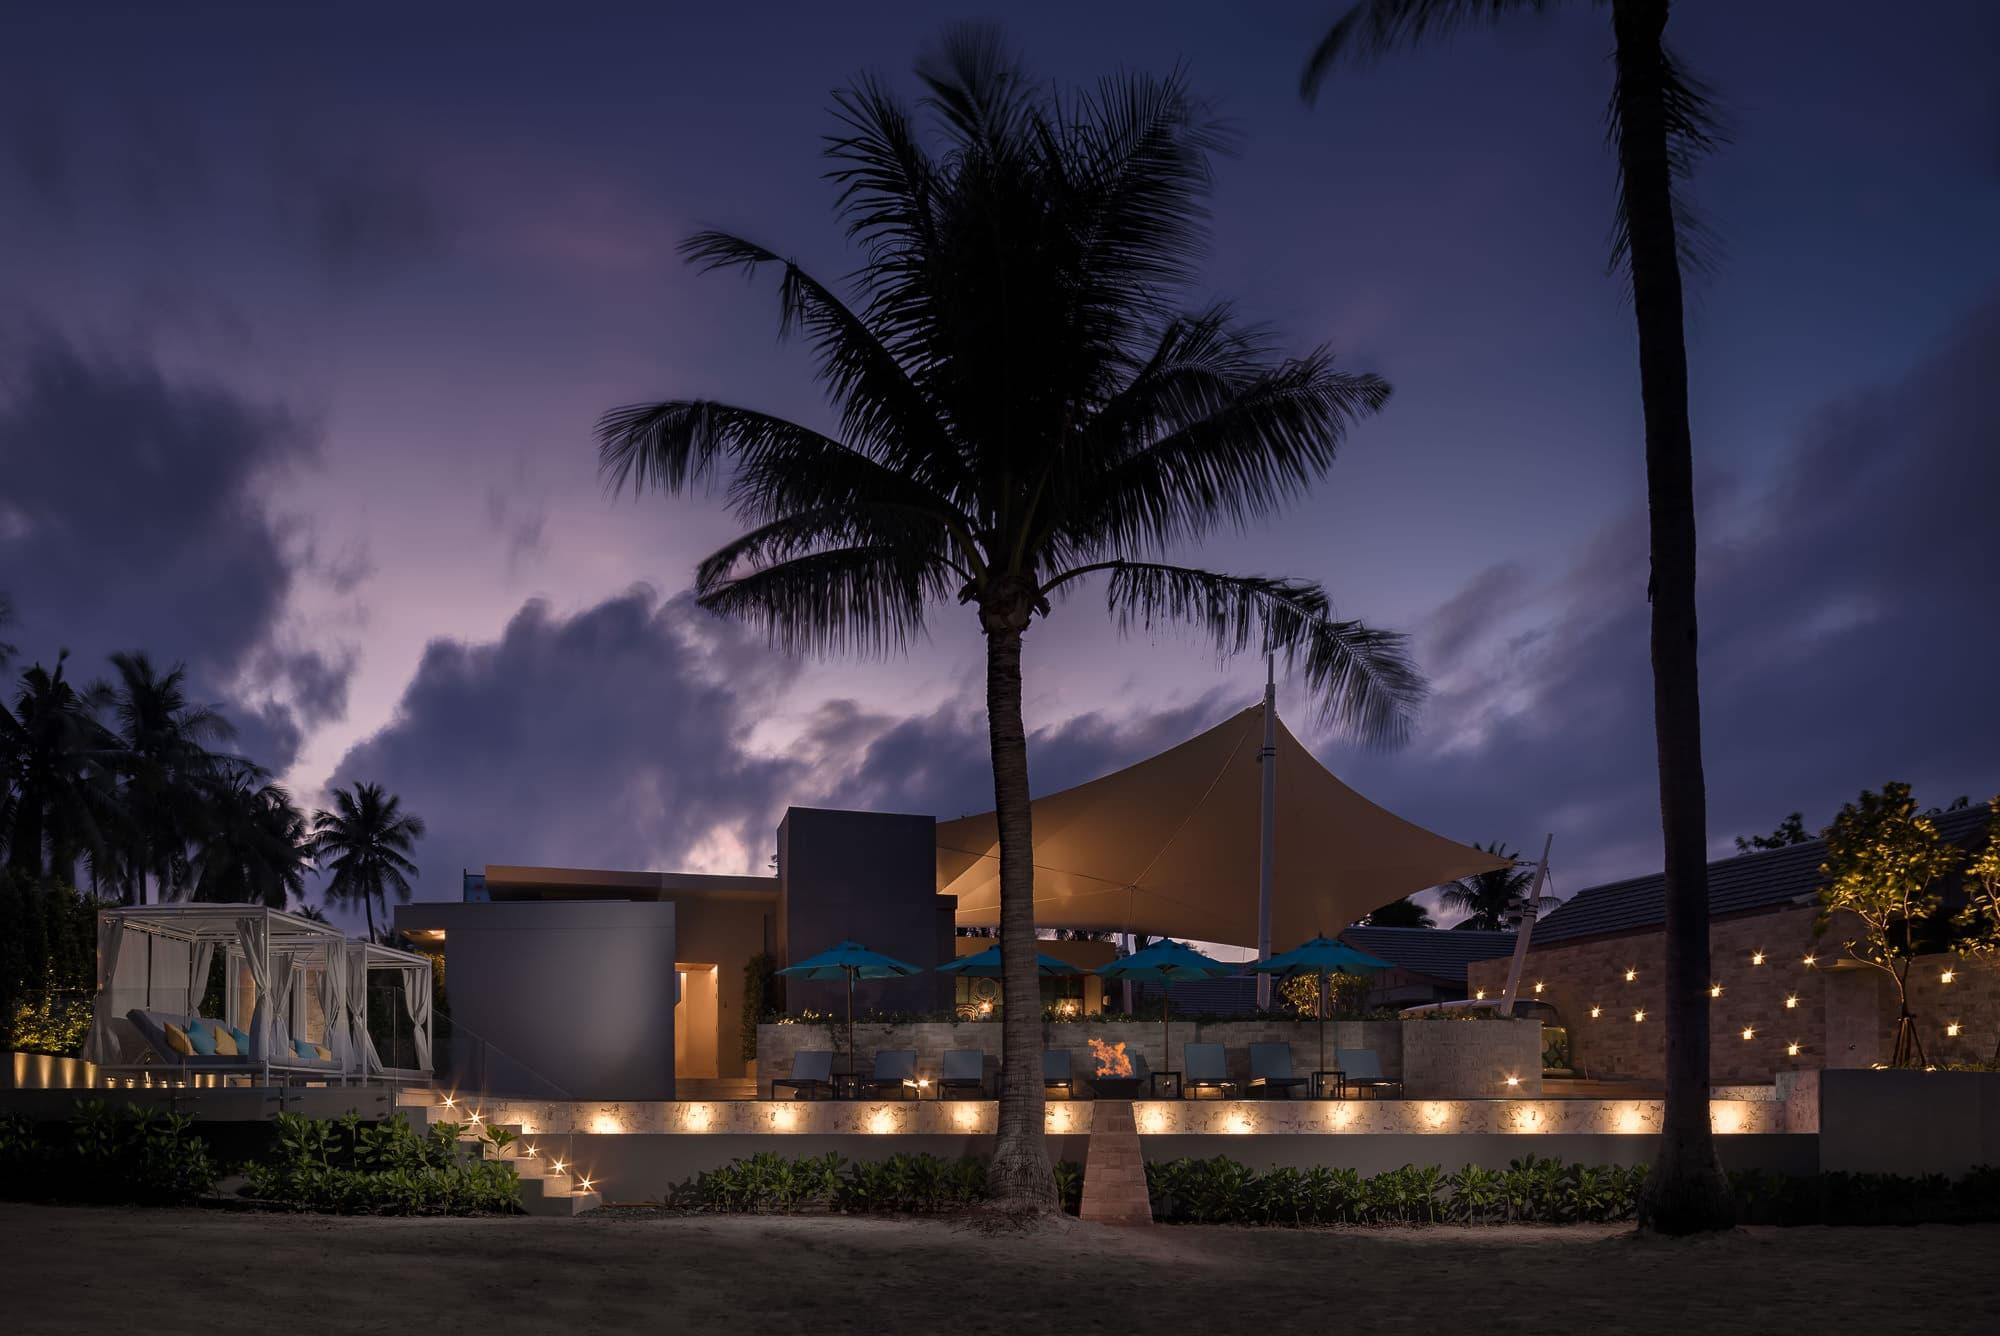 luxury hotel photography in koh samui thaland